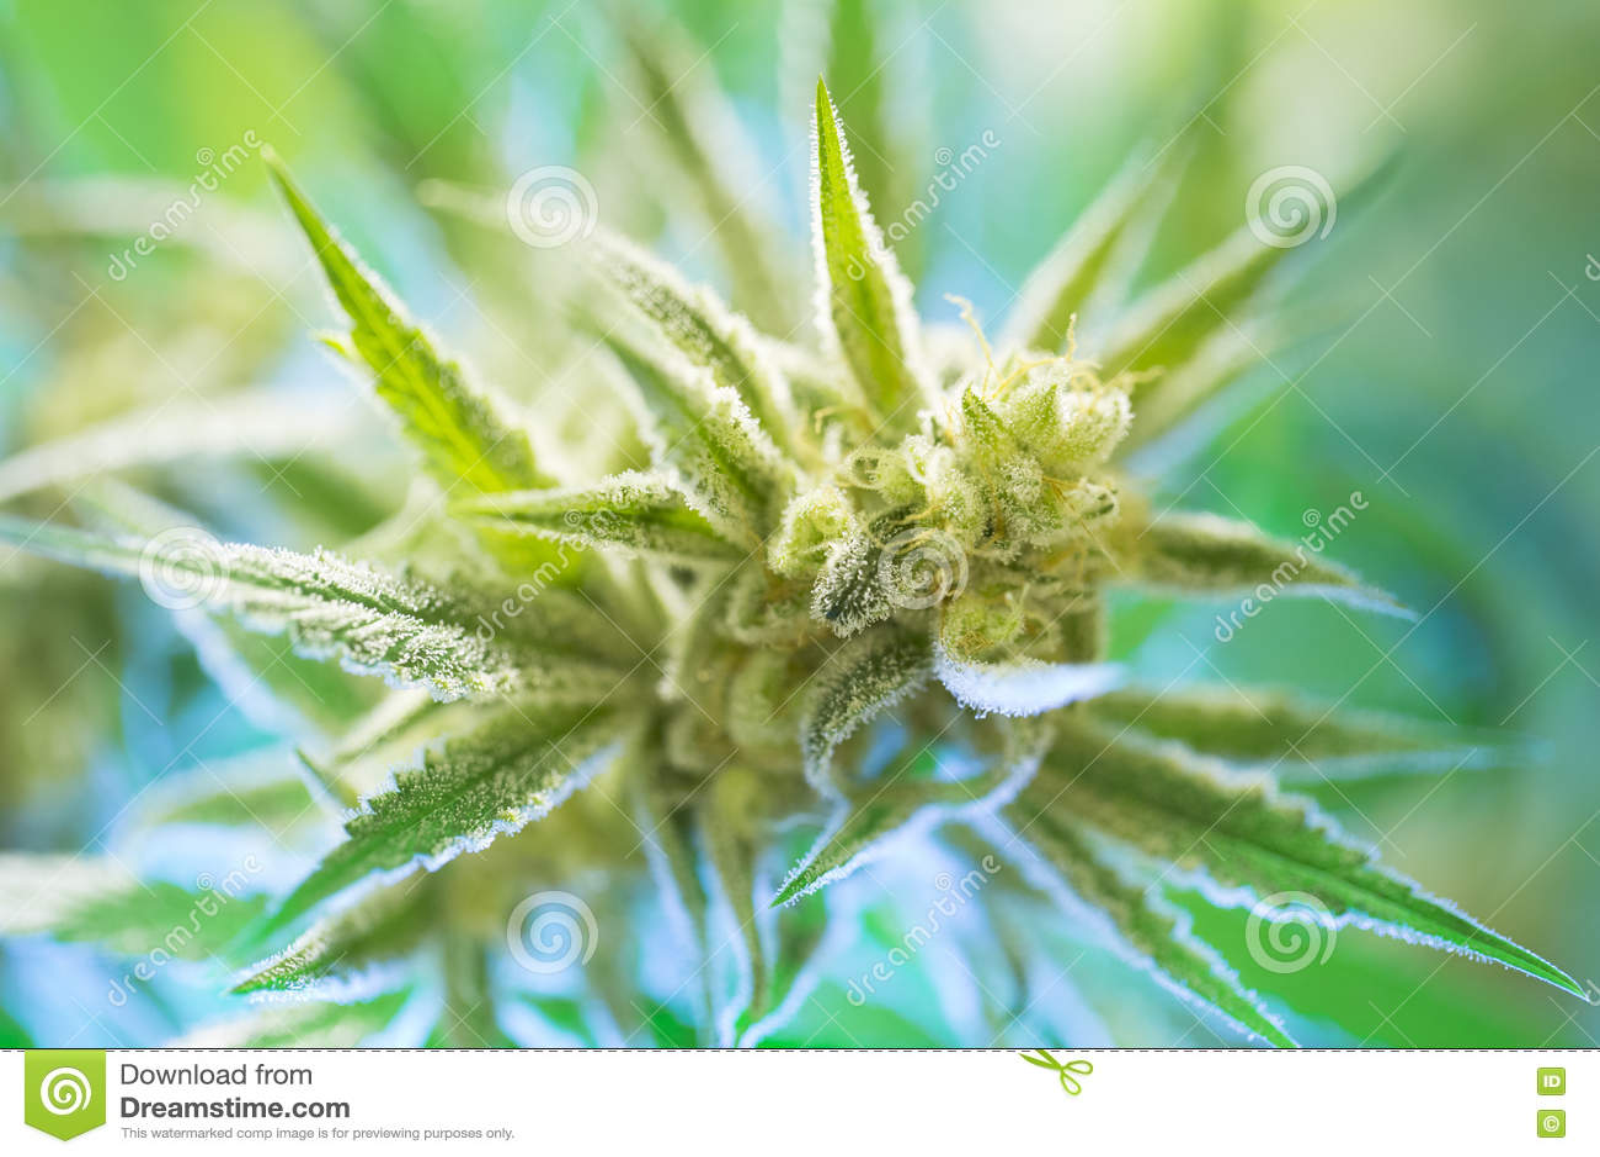 Marijuana flowering buds cannabis, hemp plant. Very large indoor weed harvest.